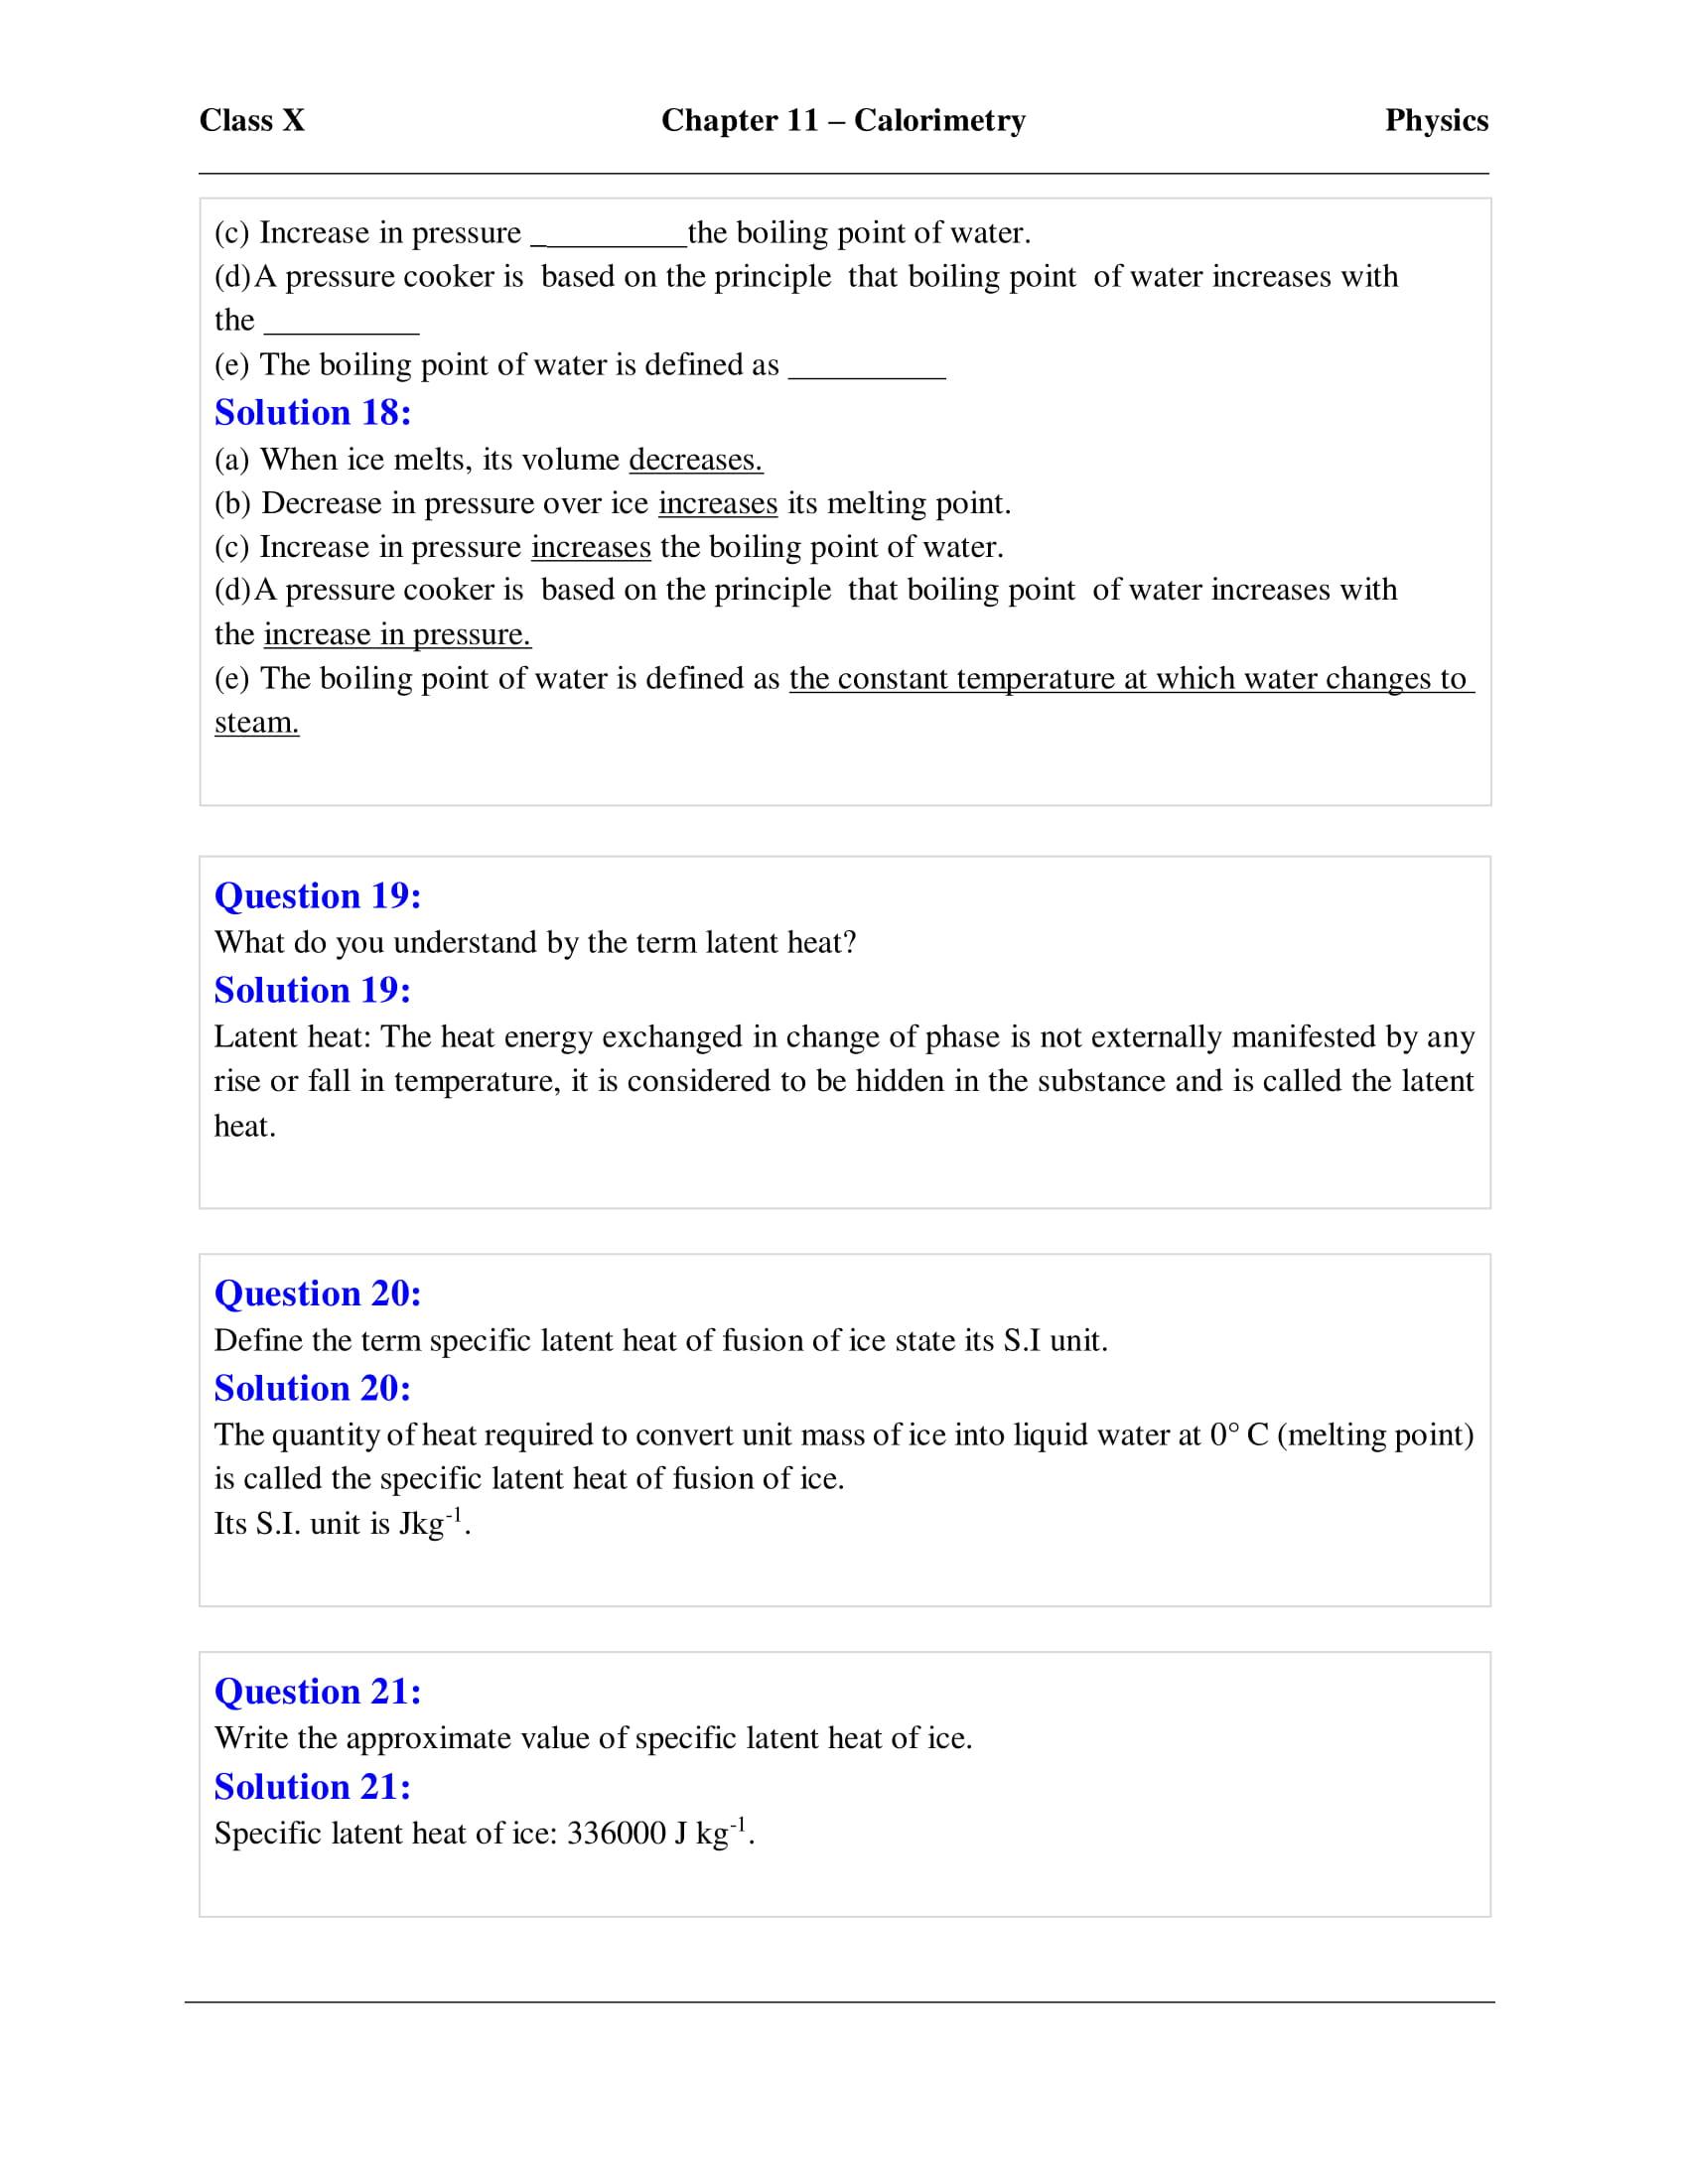 icse-selina-physics-solutions-class-10-chapter-11-calorimetry-22